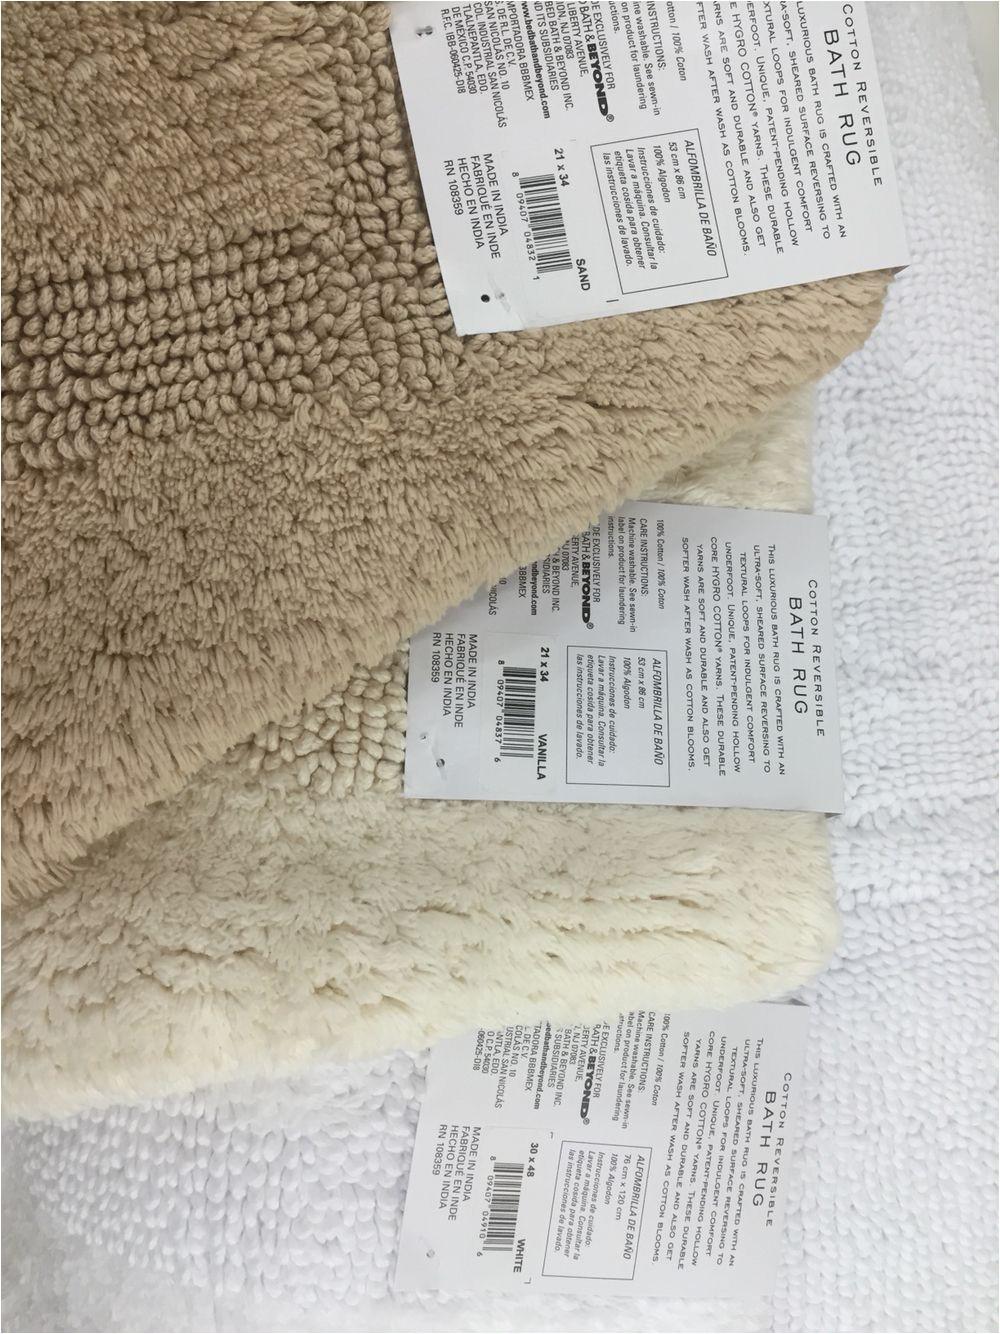 Wamsutta Reversible Cotton Bath Rugs Wamsutta Reversible 21 Inch X 34 Inch Bath Rug In Vanilla